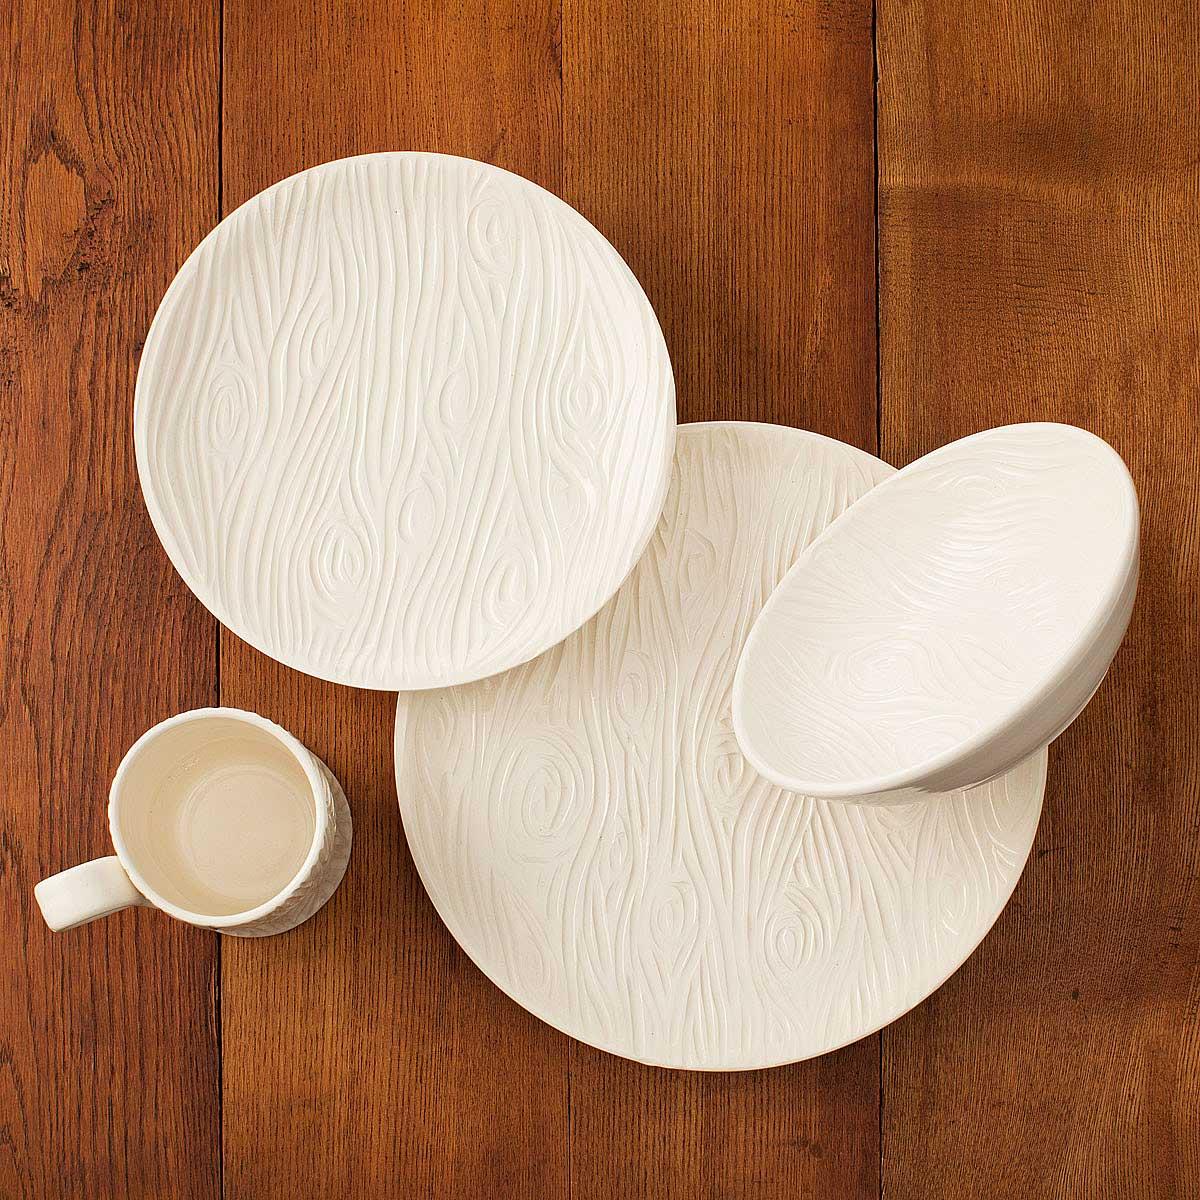 Porcelain Faux Bois Dishware Collection 2 thumbnail & Porcelain Faux Bois Dishware Collection | porcelain plates dishes ...